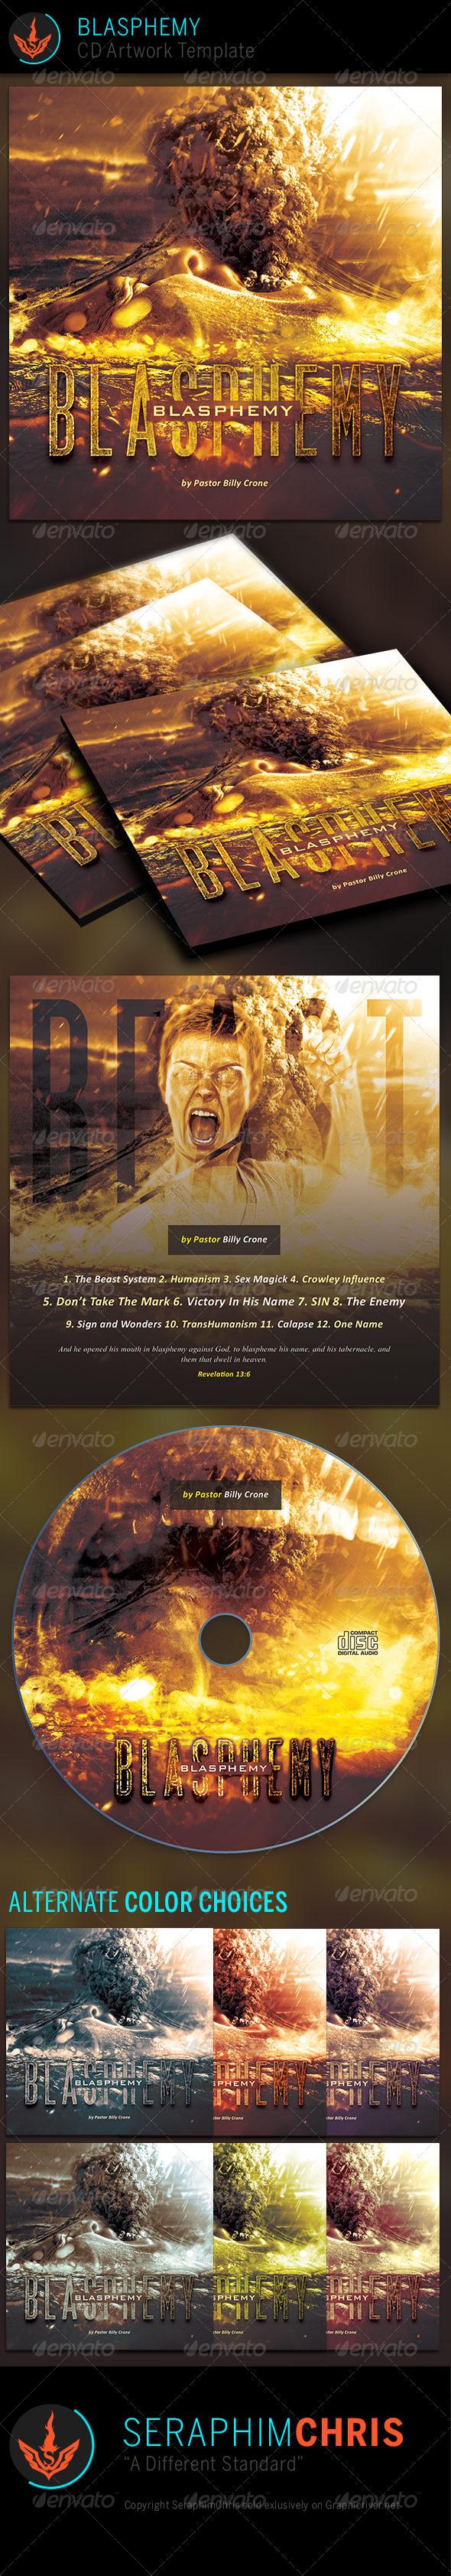 Blasphemy: CD Artwork Template - CD & DVD Artwork Print Templates